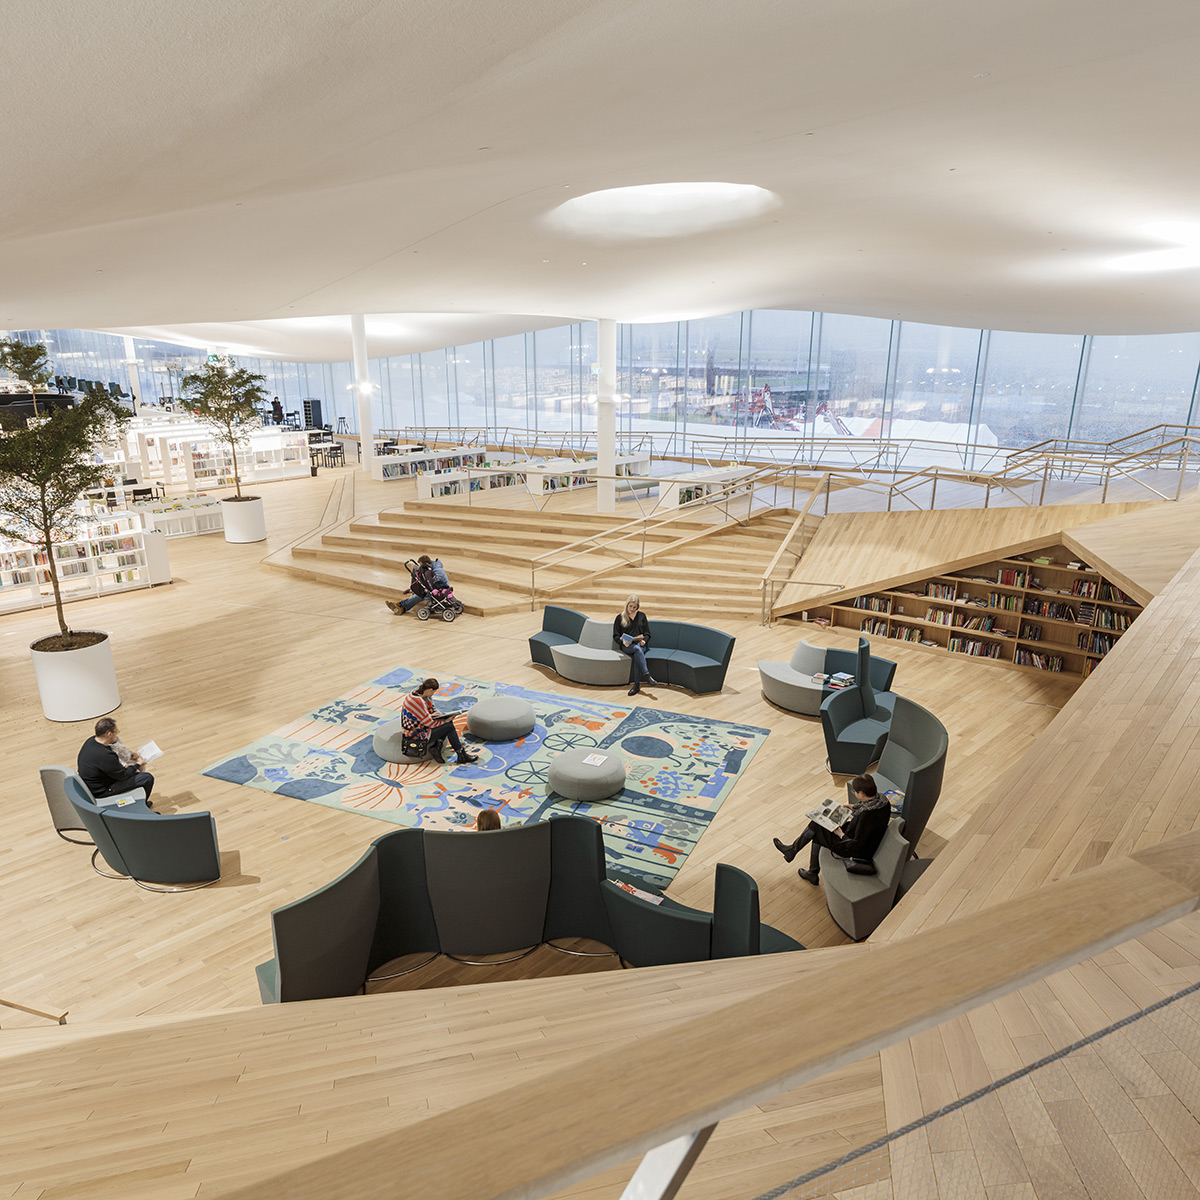 oodi-biblioteca-central-helsinki-ala-architects-tuomas-uusheimo-10